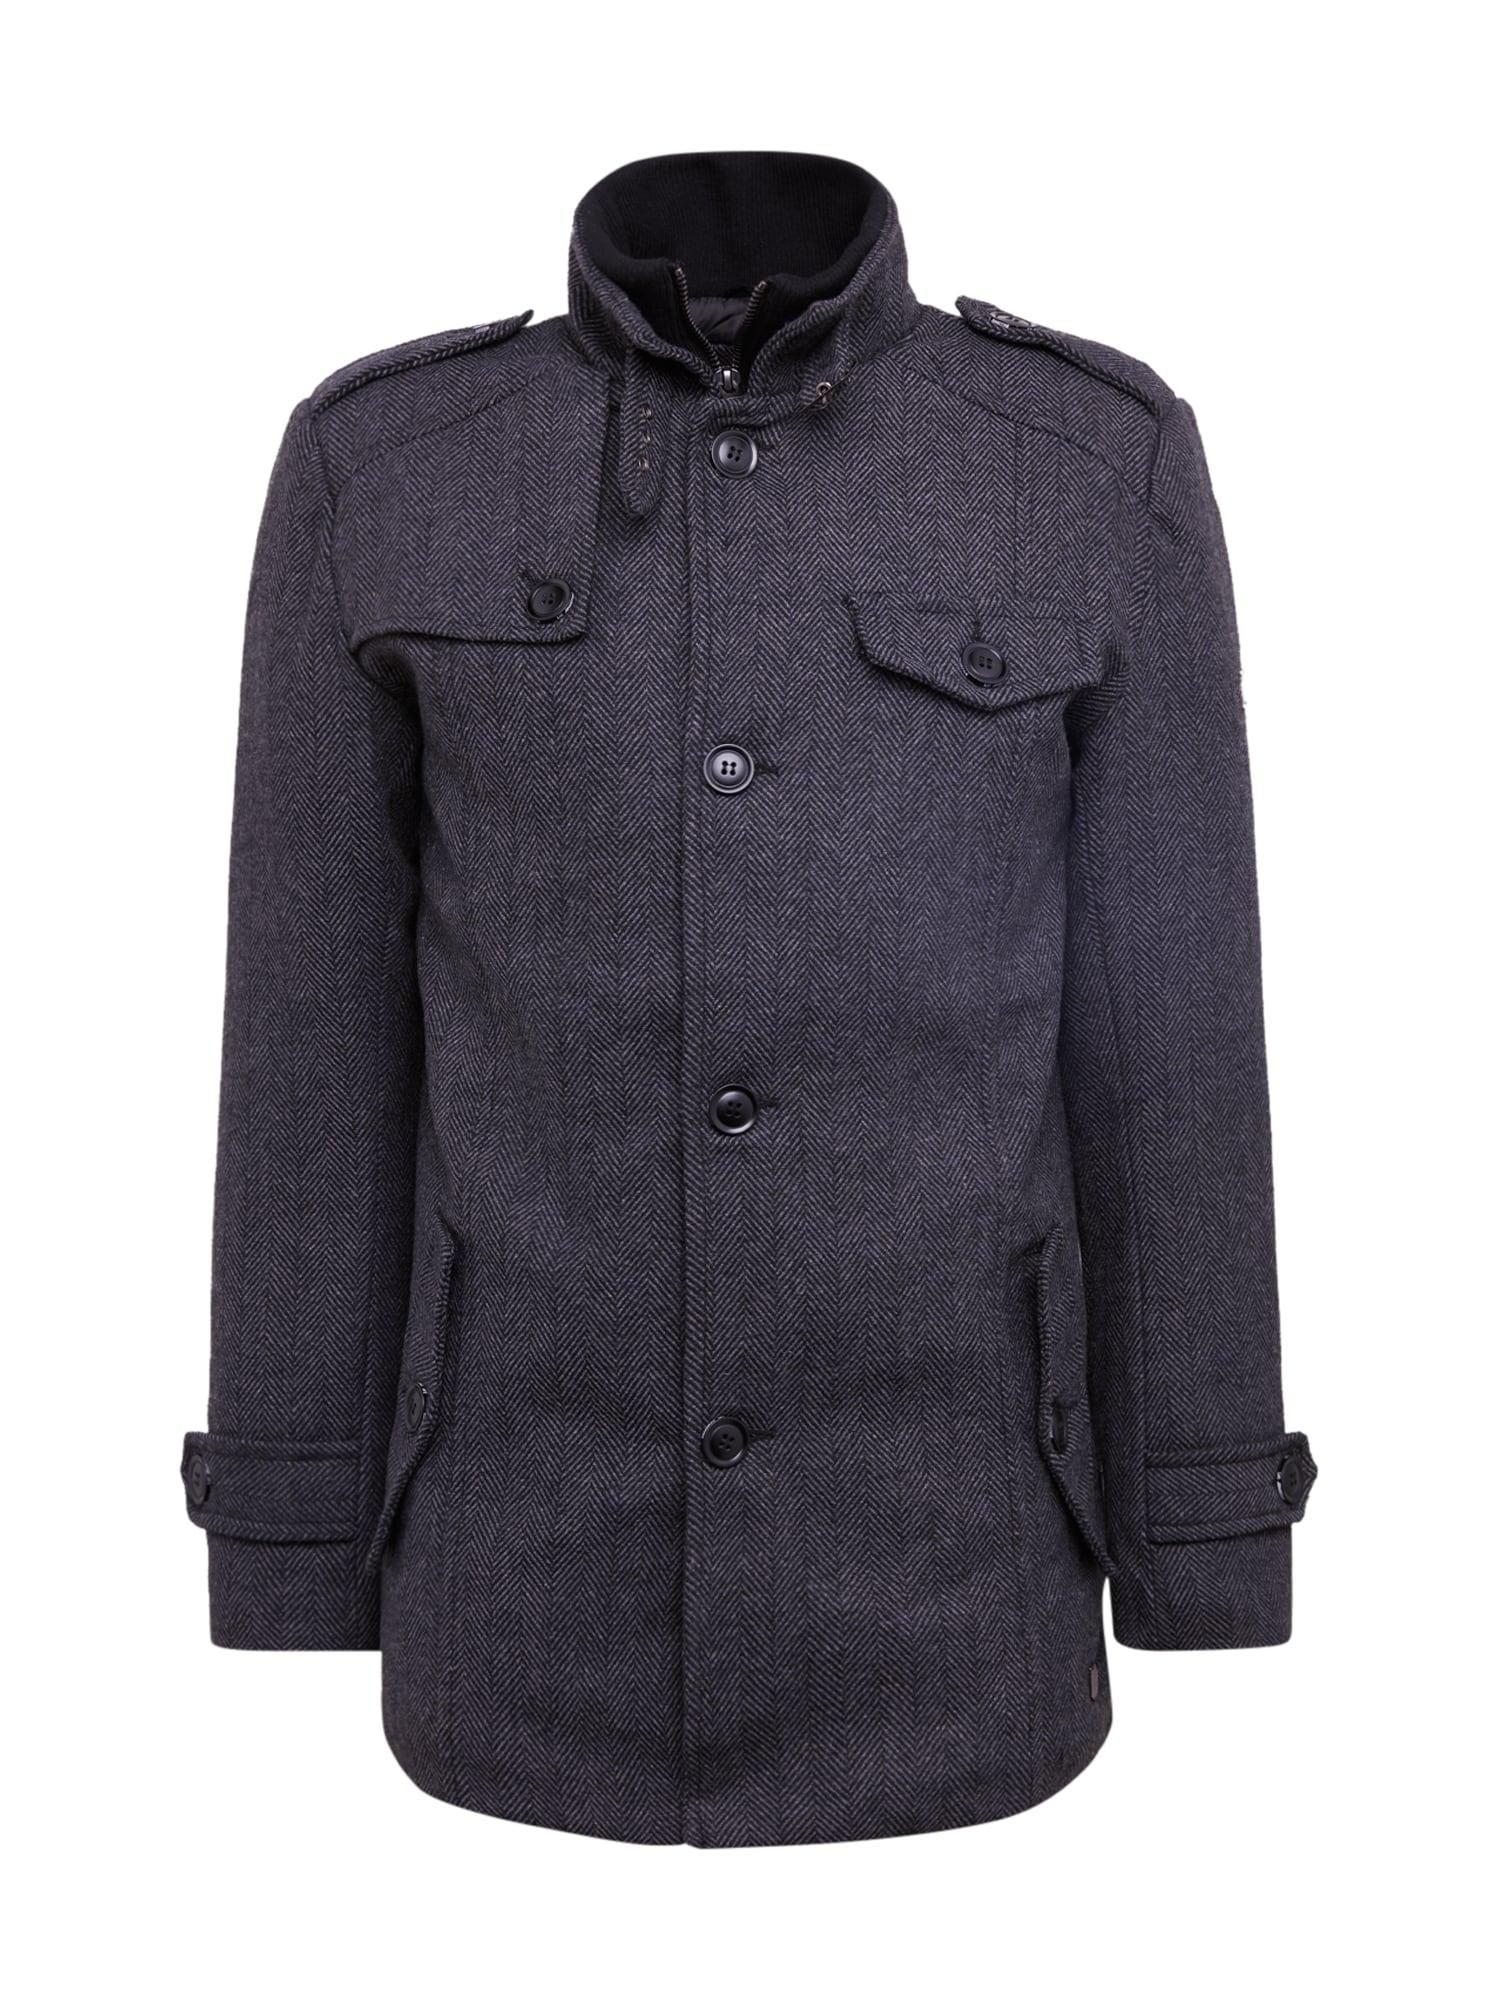 INDICODE JEANS Rudeninis-žieminis paltas 'Brendan' pilka